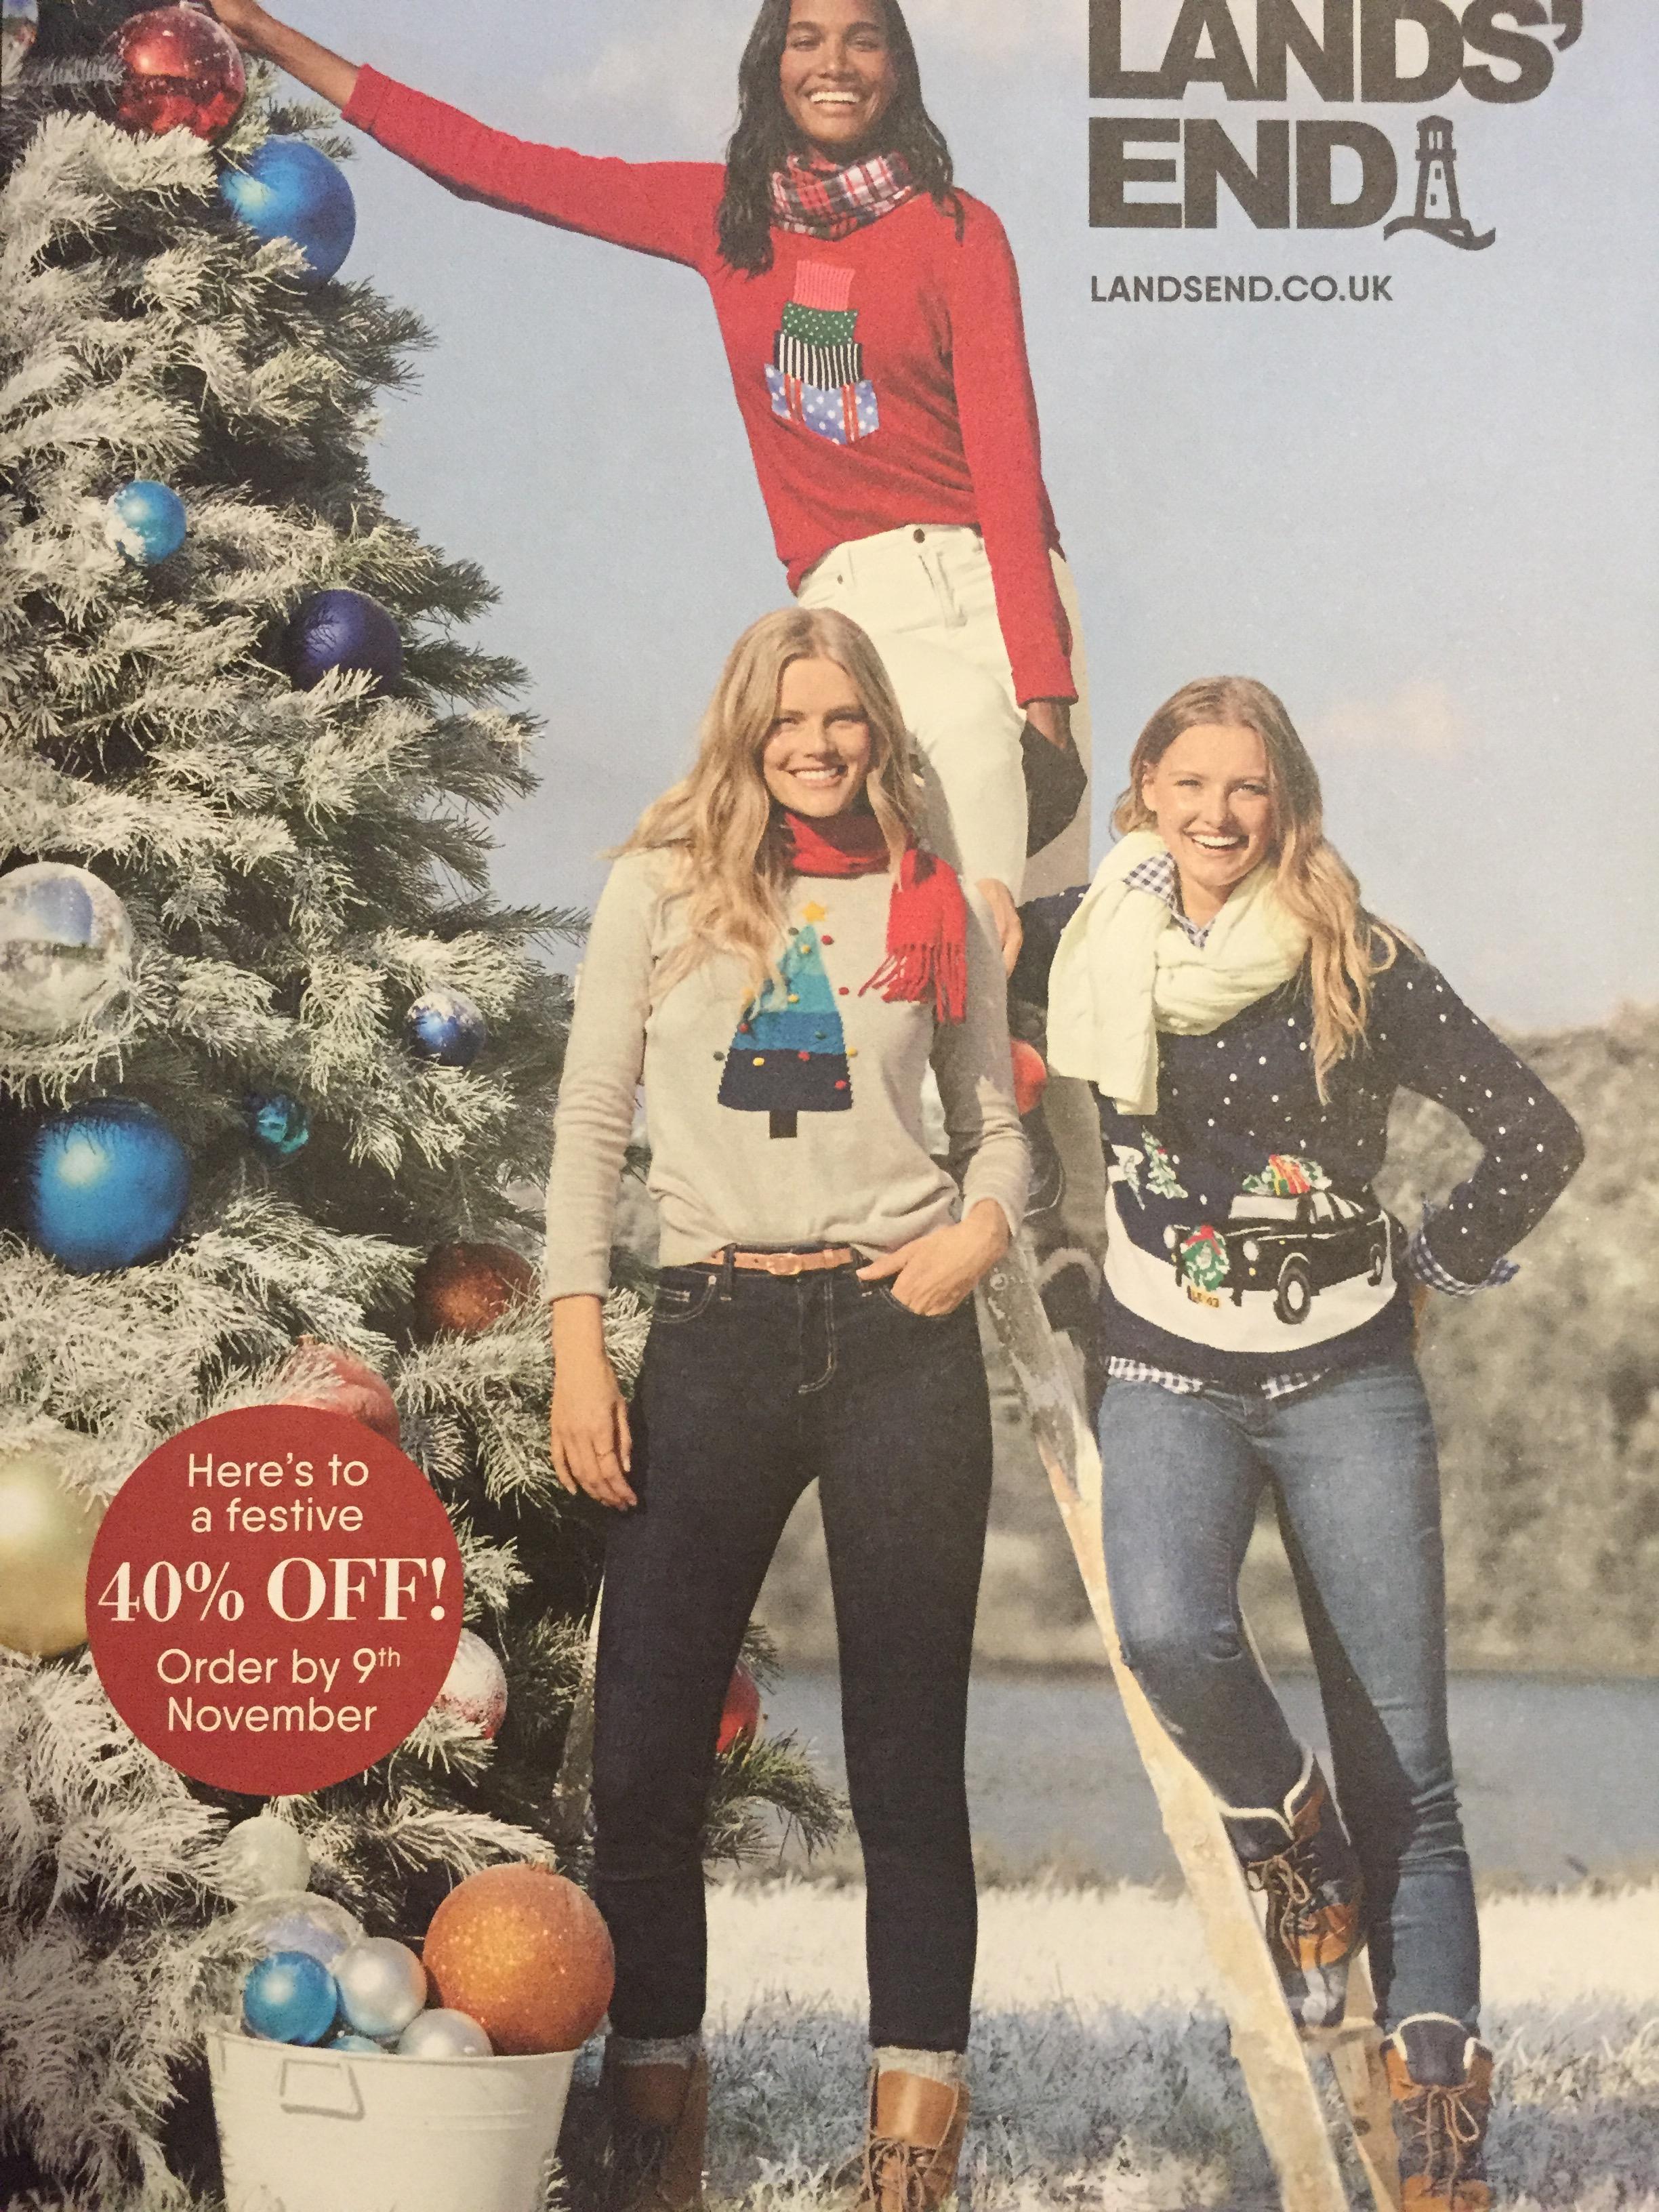 40% off code for Landsend valid on Full priced items, Men's, Women's, Kids Fashion p&p £3.95